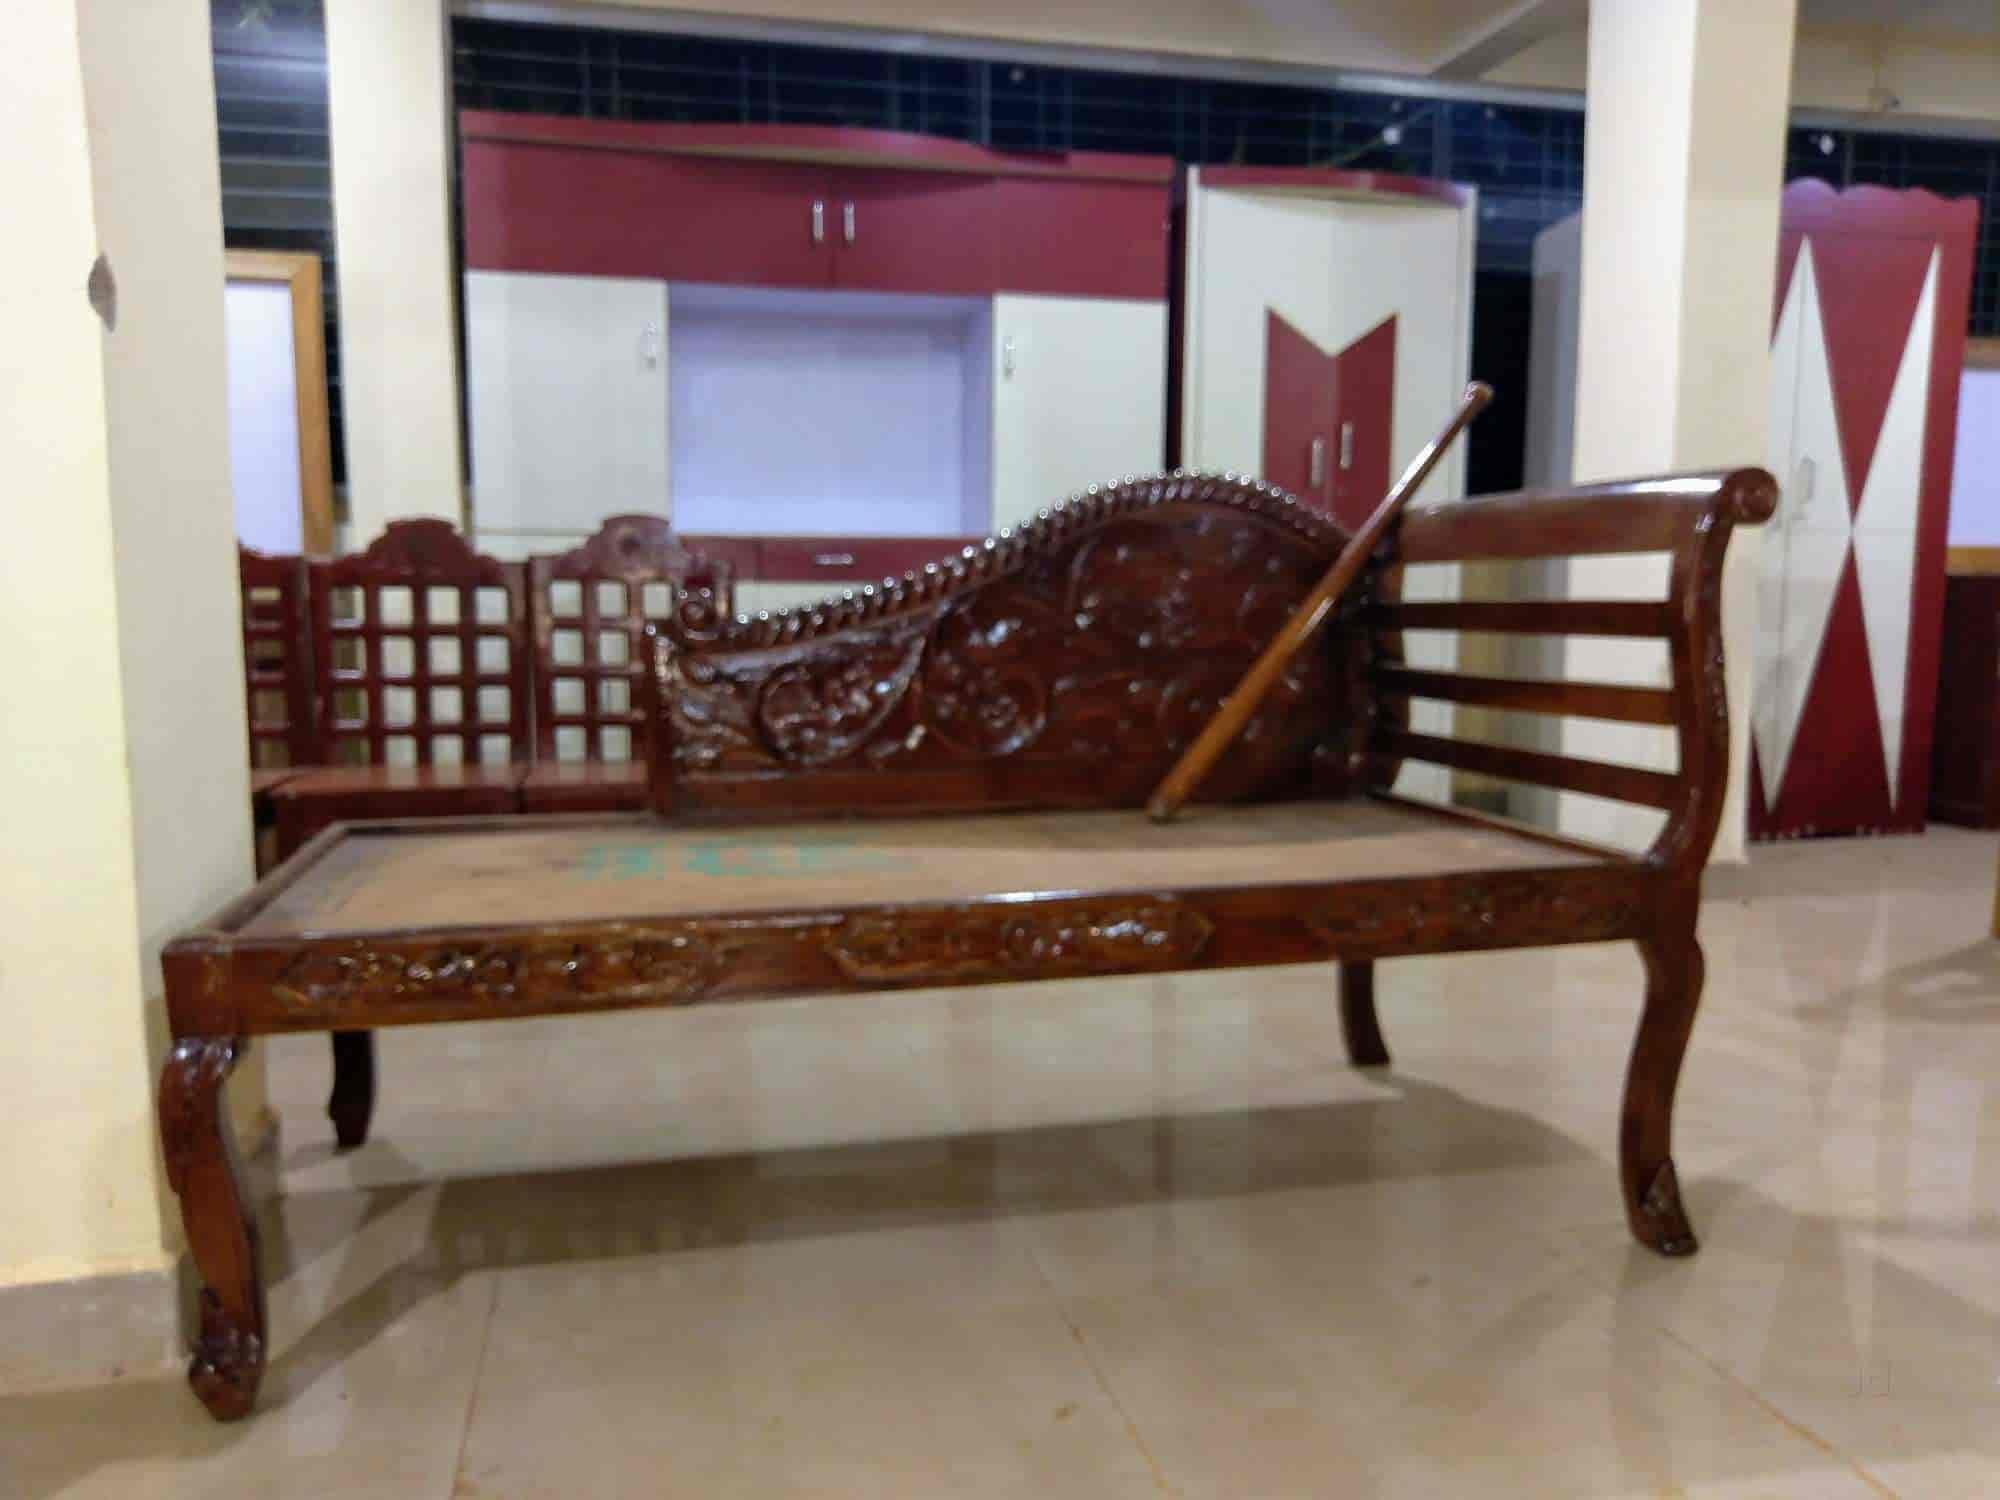 Home centre furniture khed furniture dealers in ratnagiri justdial